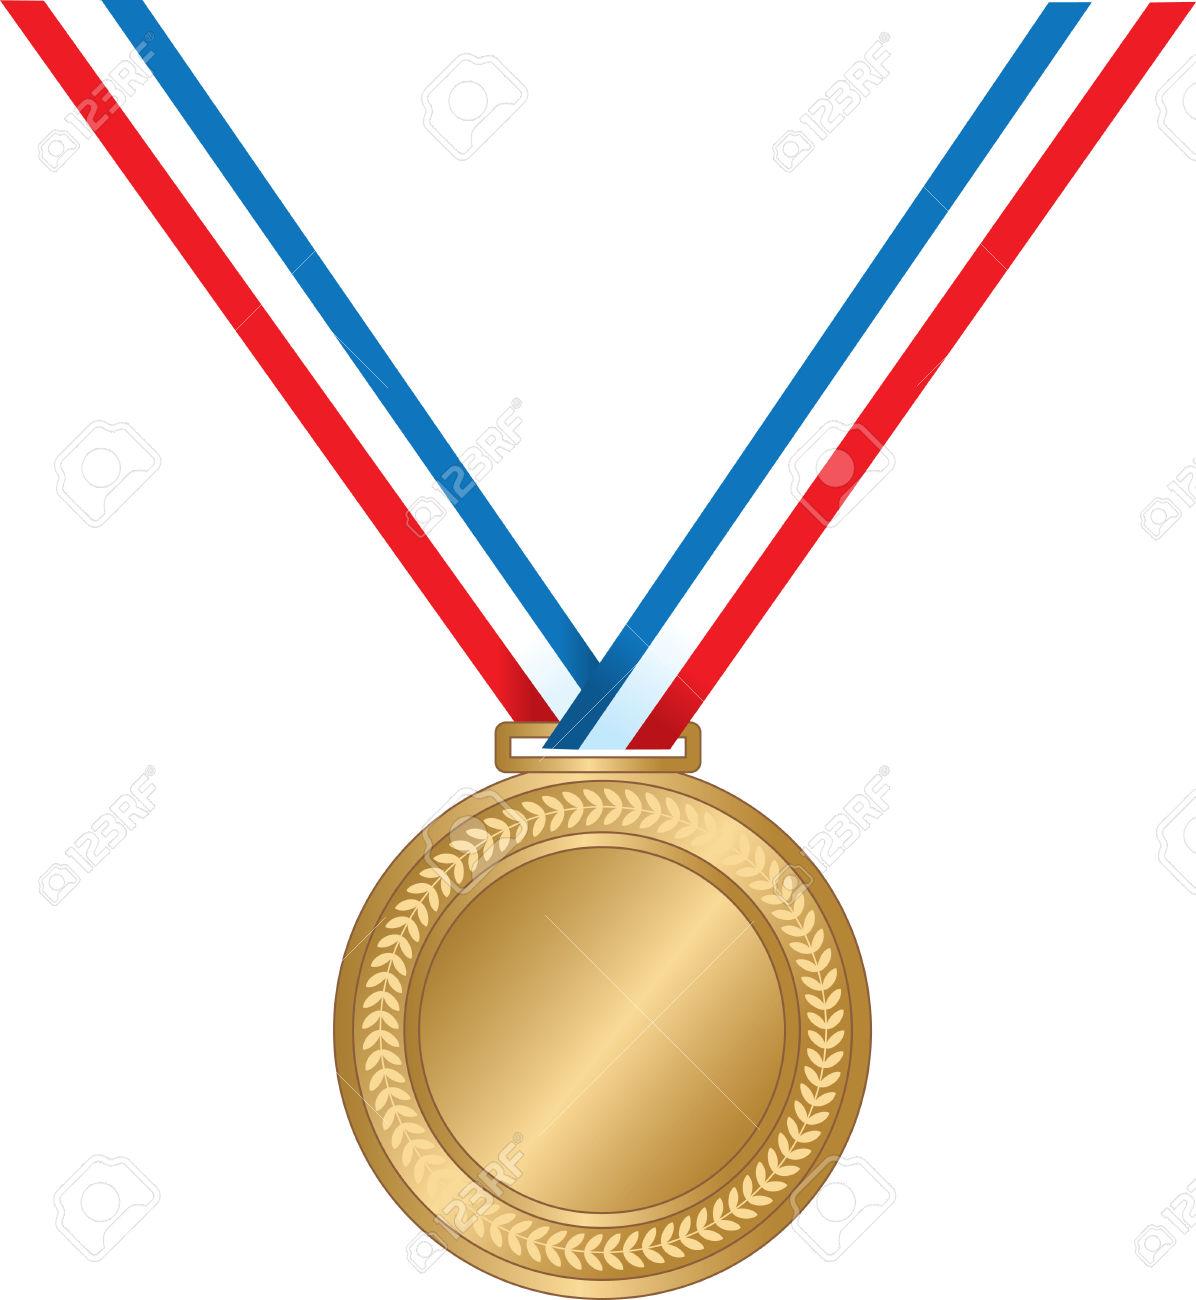 Medals Clipart.